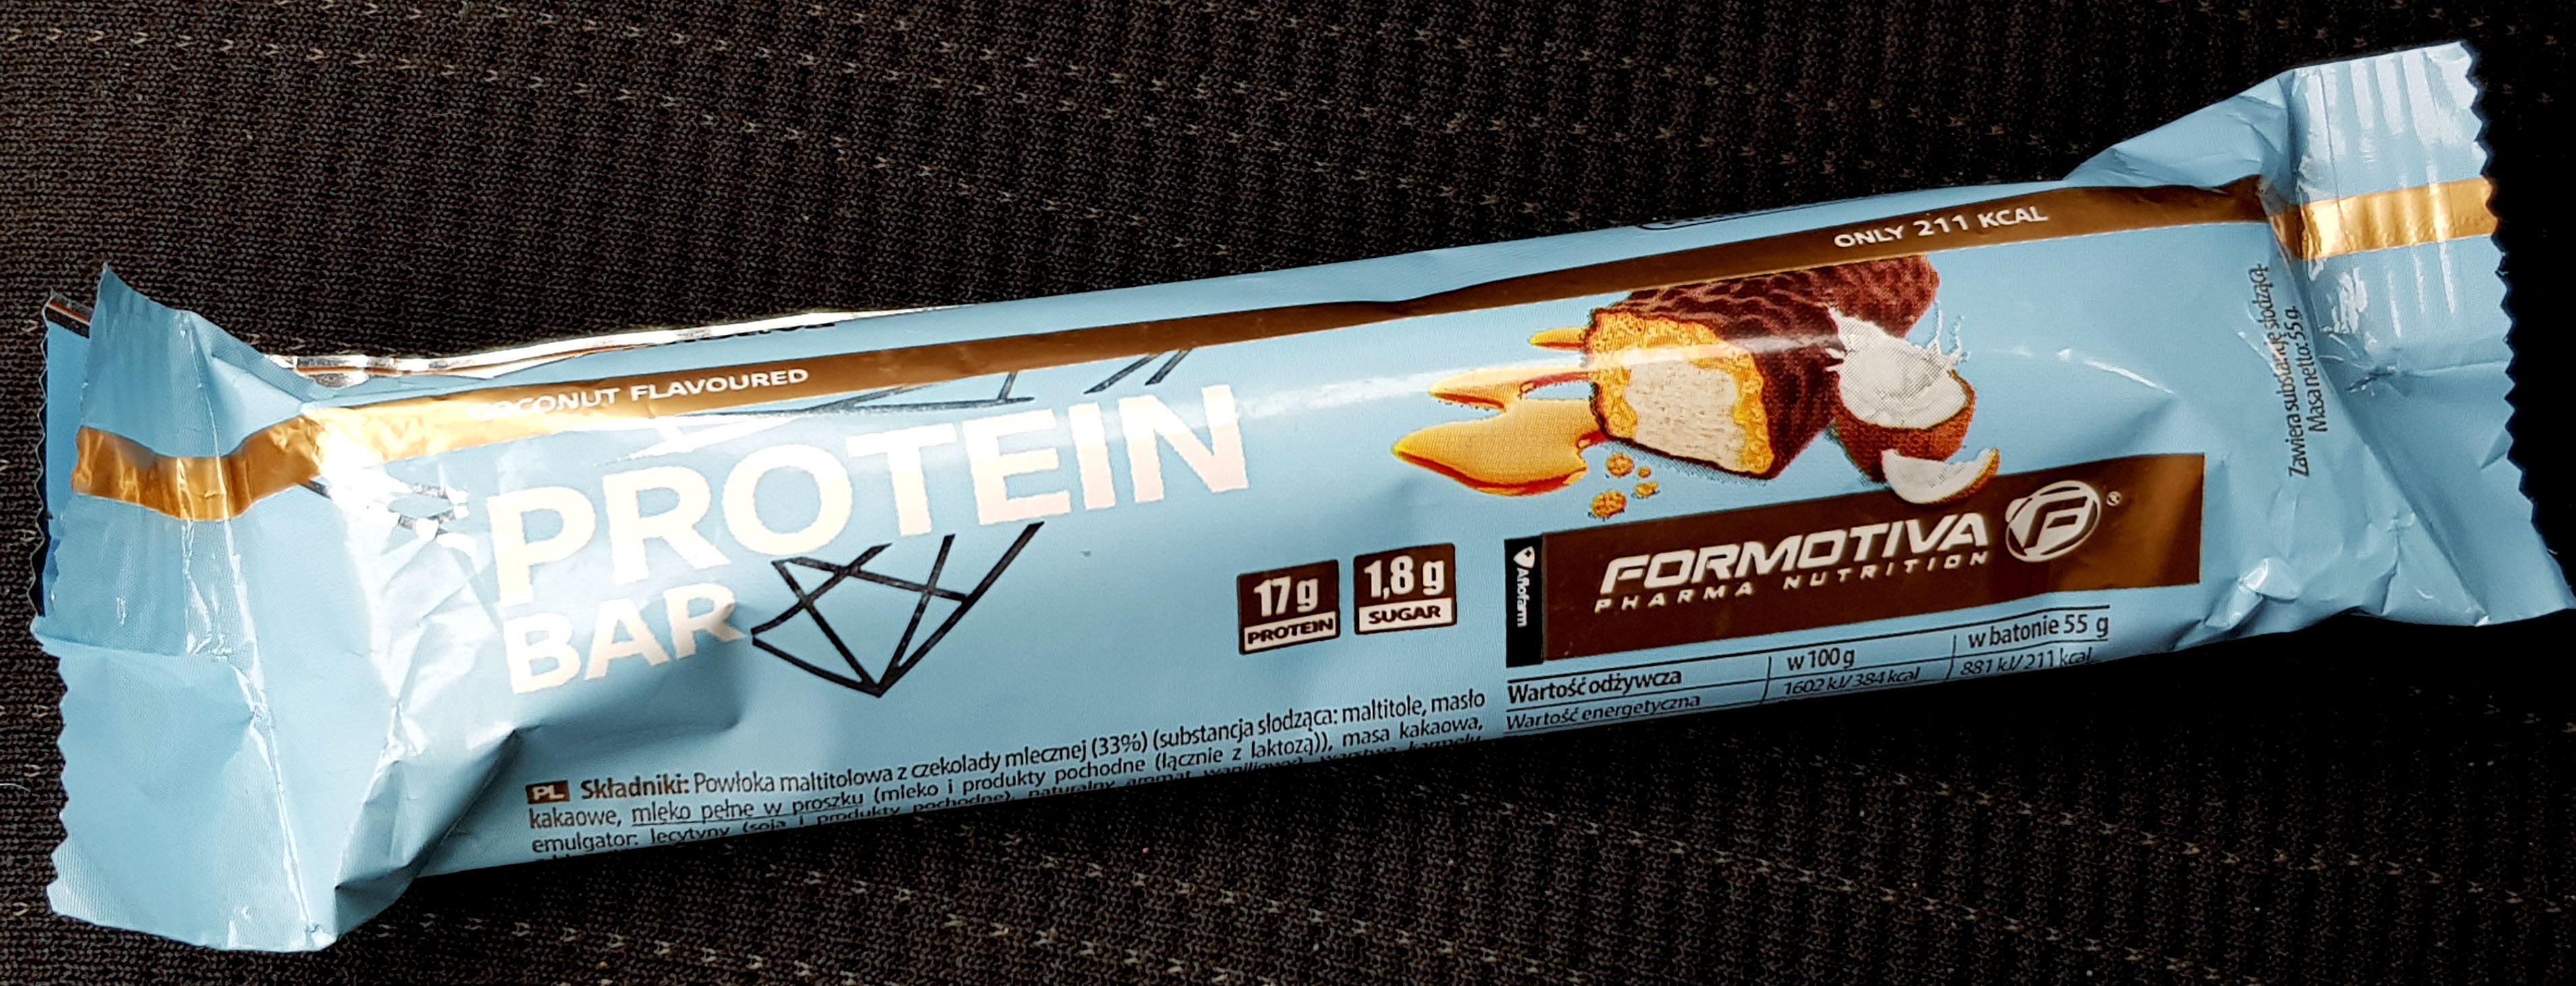 Formotiva Coconut baton proteinowy recenzja